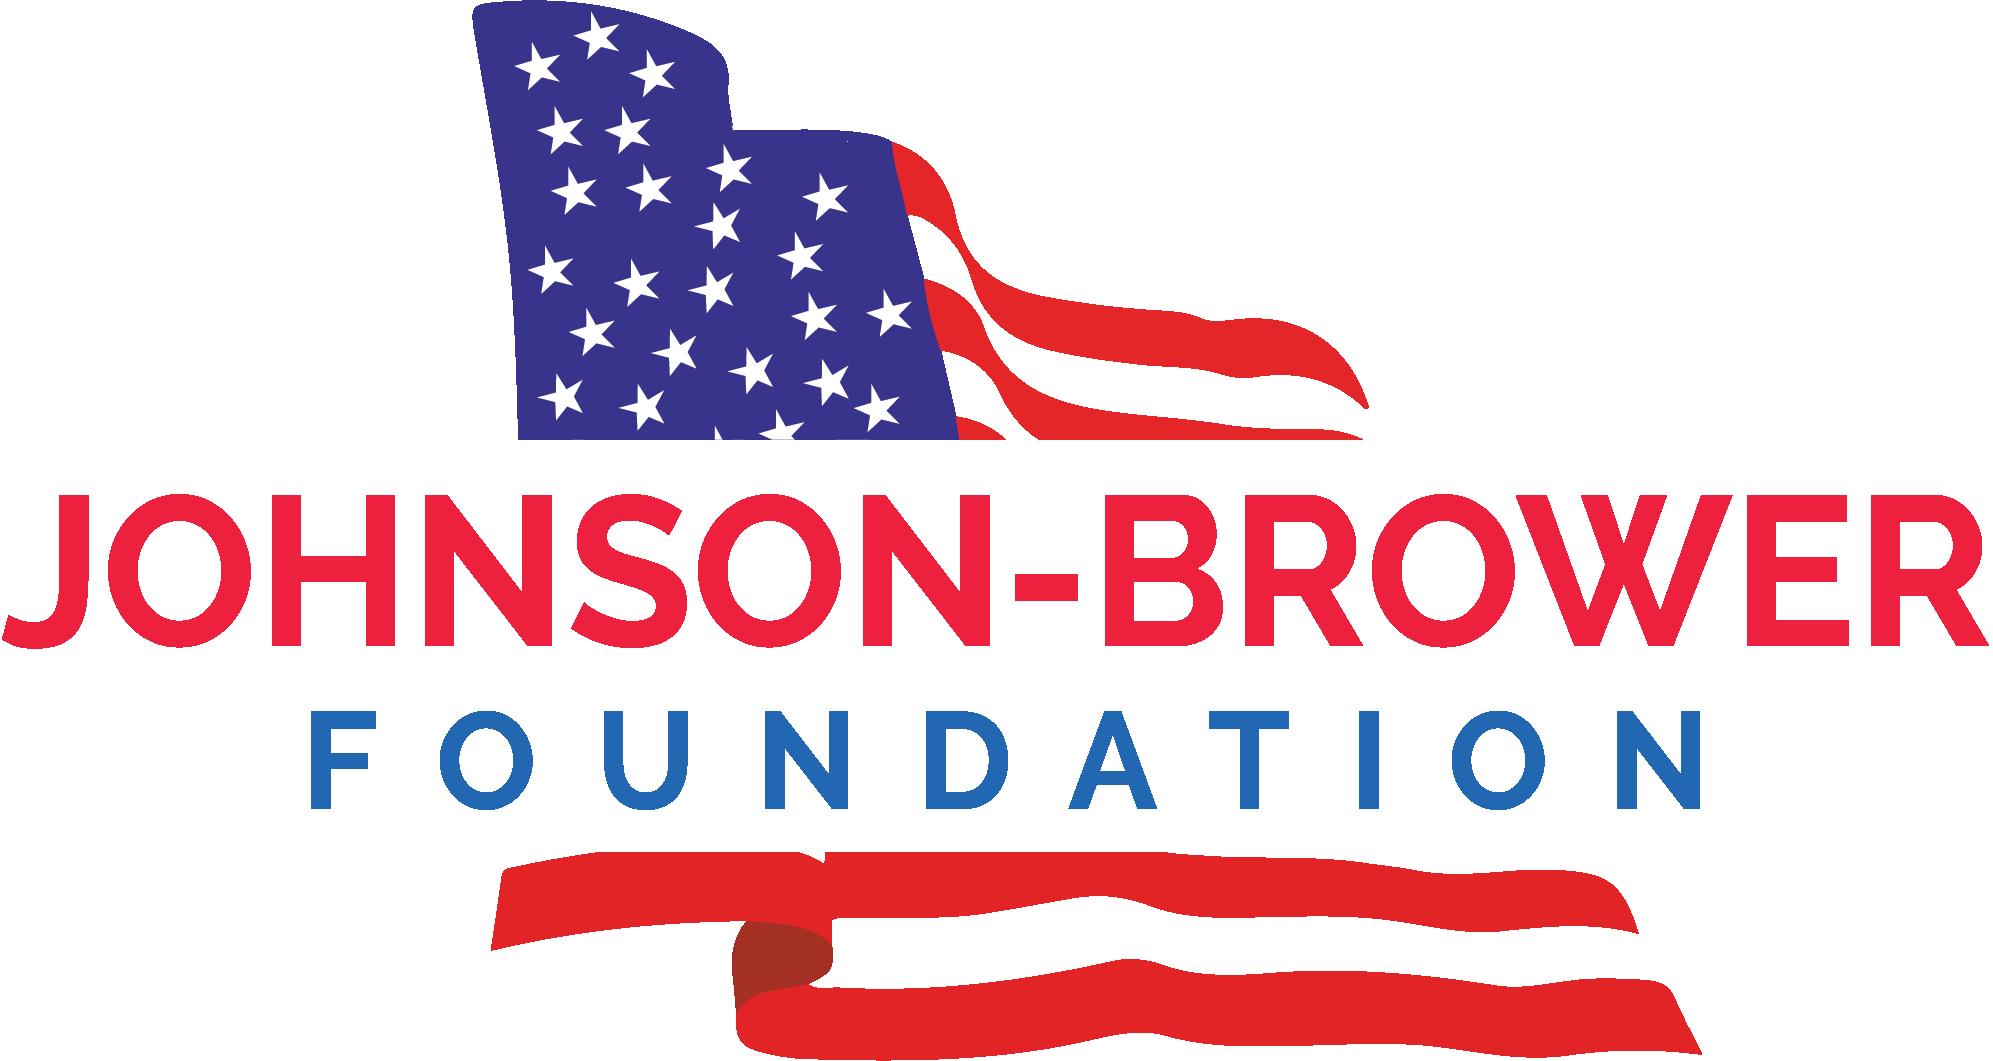 Johnson_141217-2.png